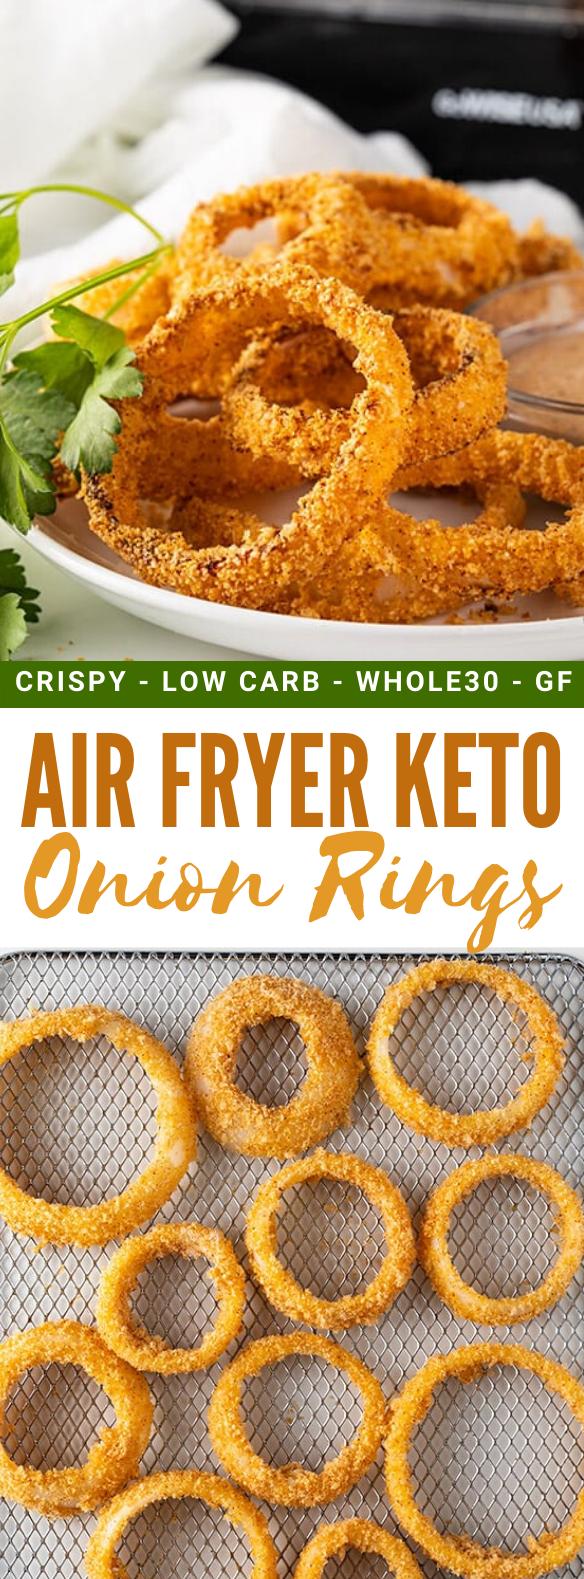 AIR FRYER KETO ONION RINGS RECIPE healthy diet